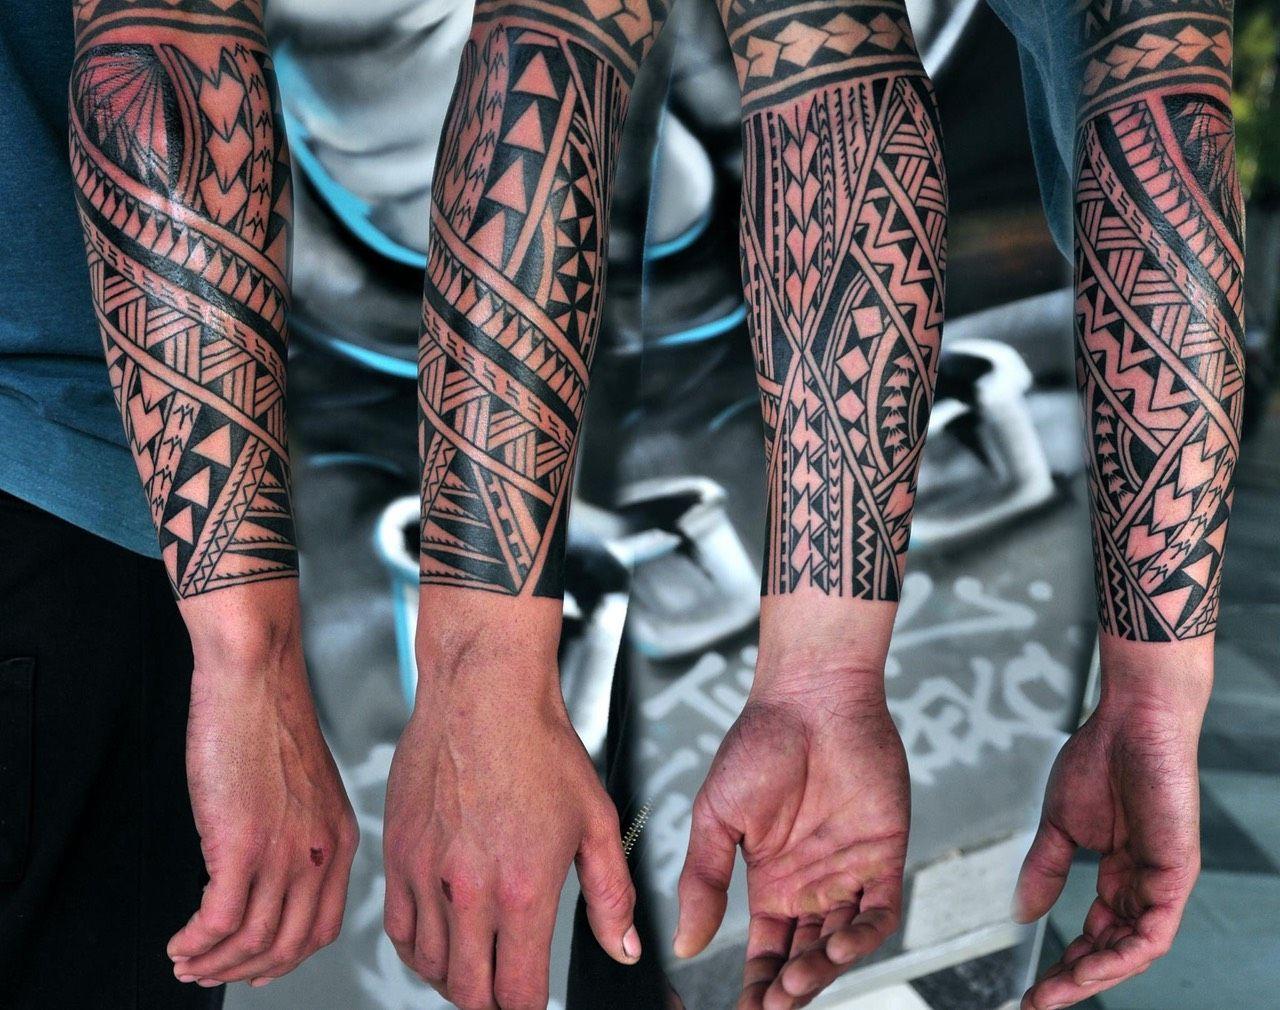 Manospaterakis tattoospolynesiansleeve polynesian